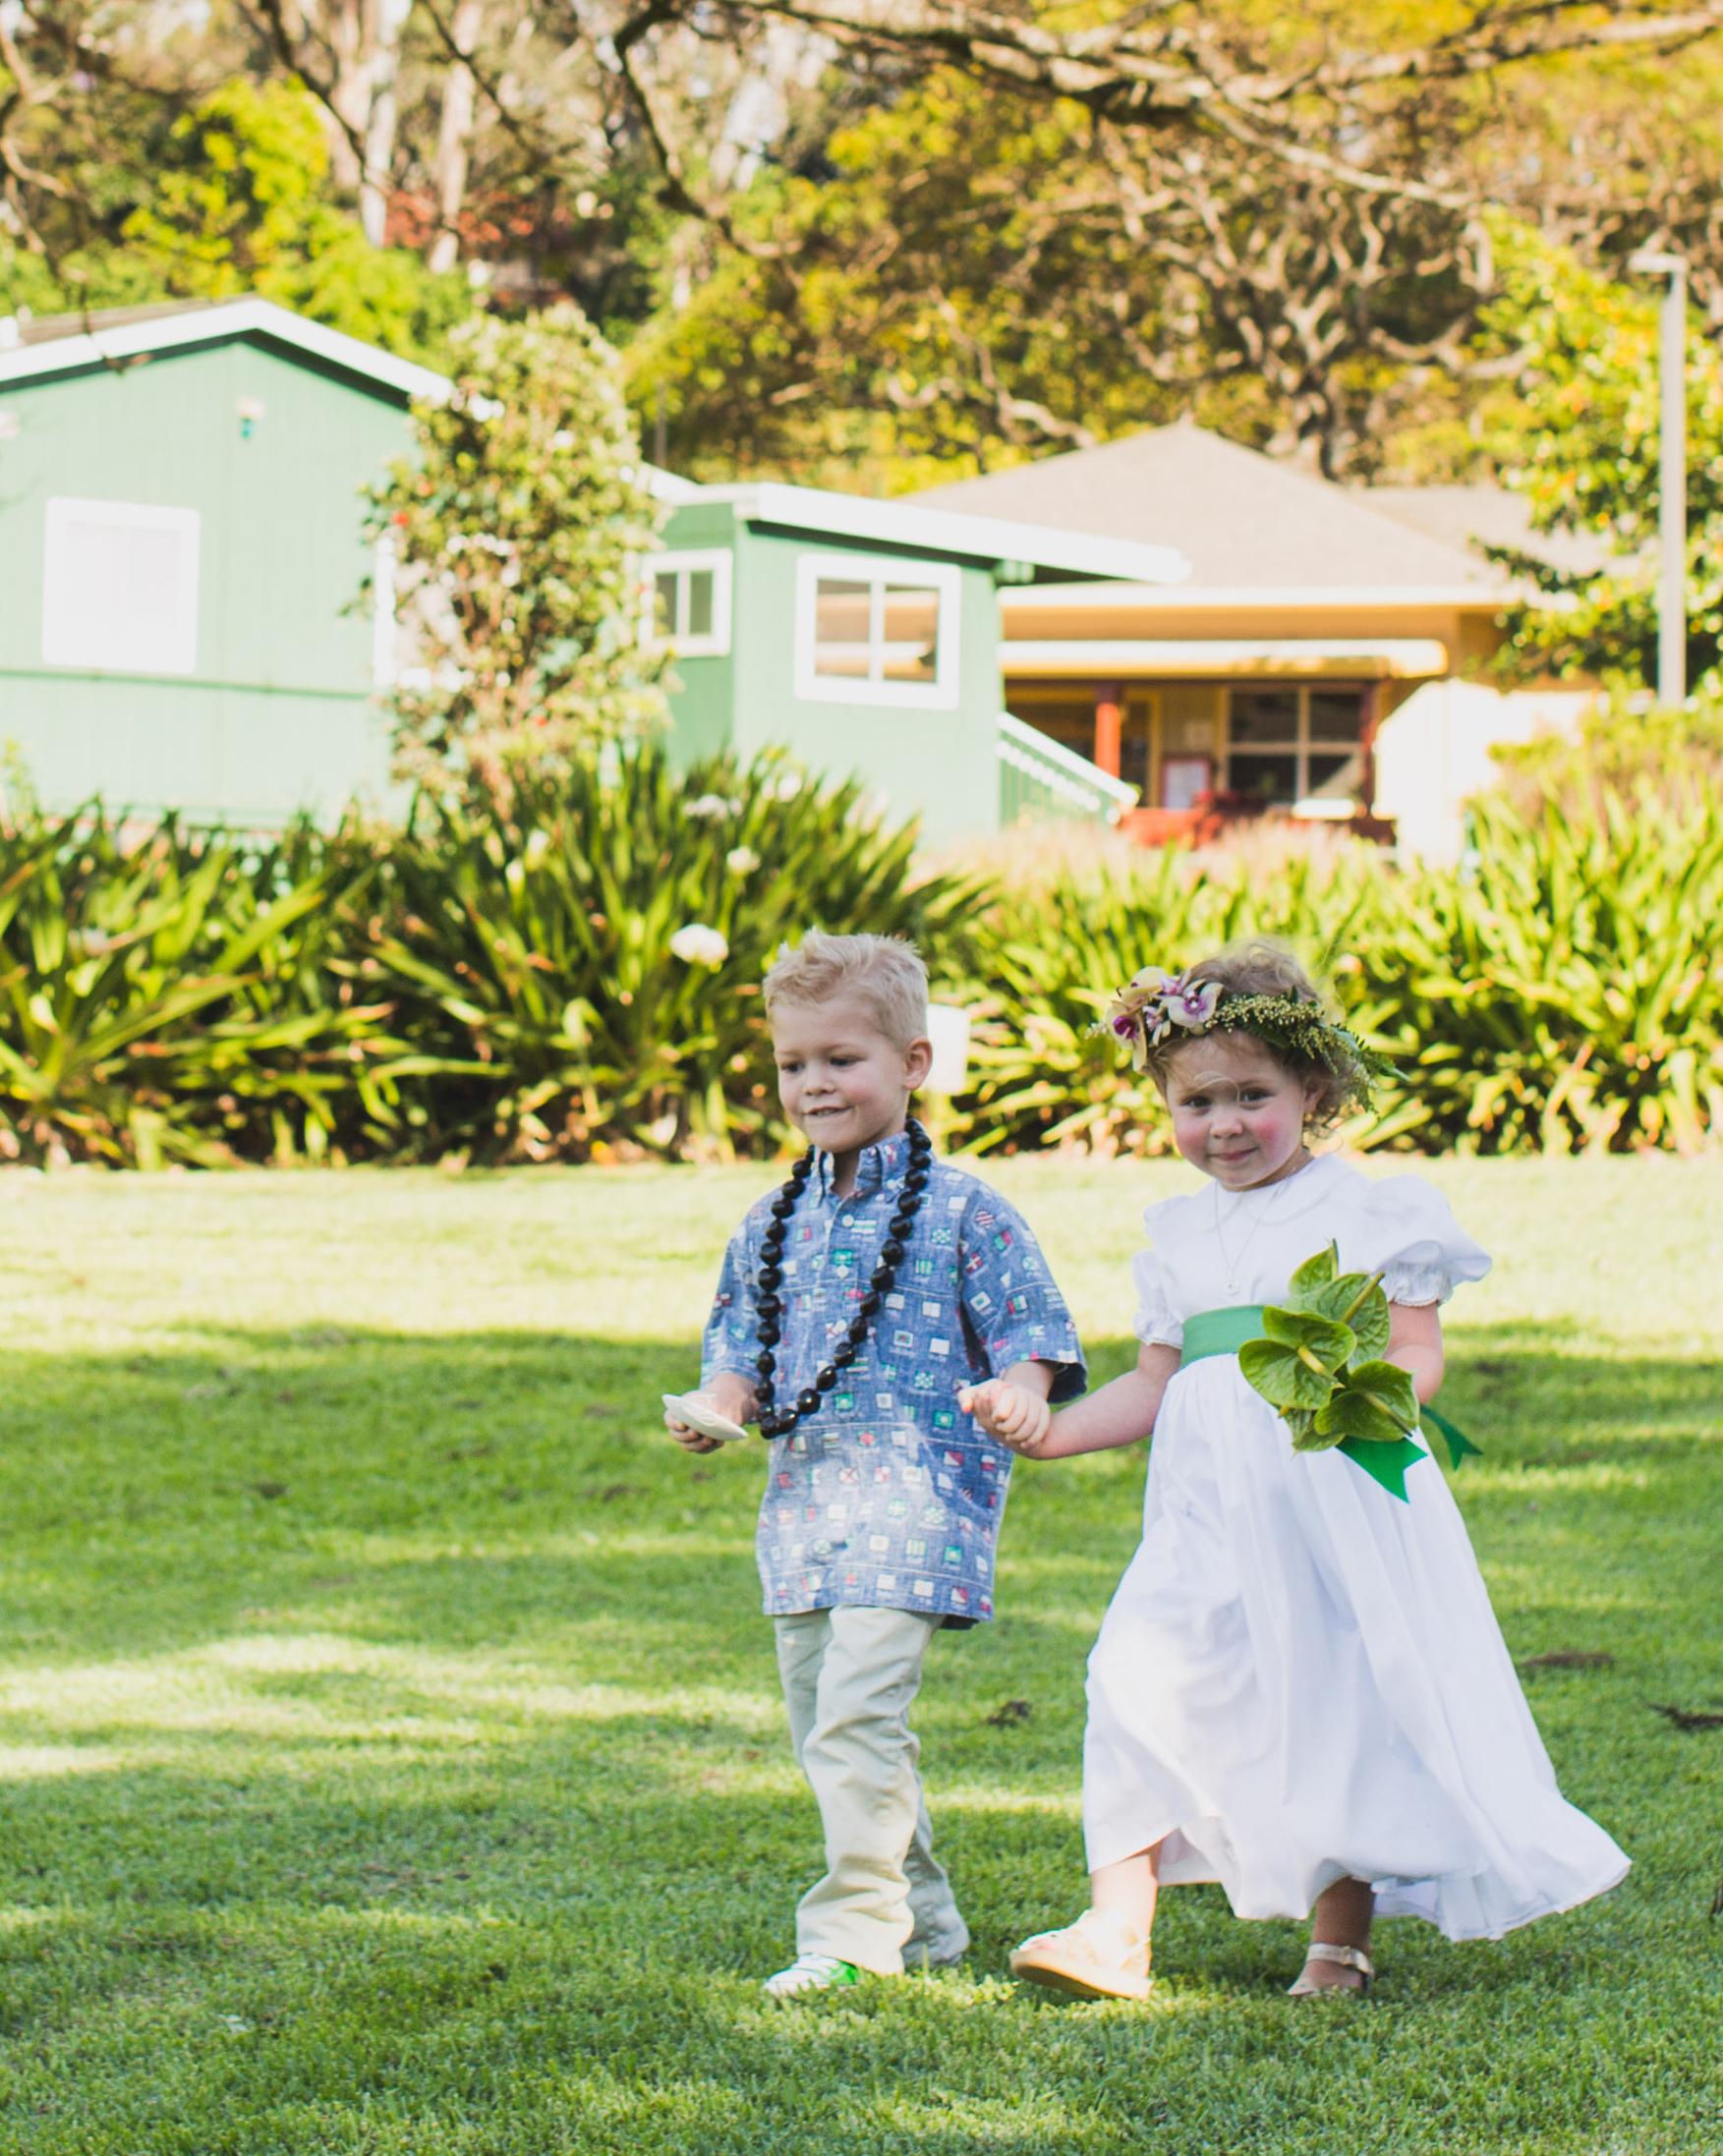 maddie-tony-wedding-kids-9382-s112424-1015.jpg